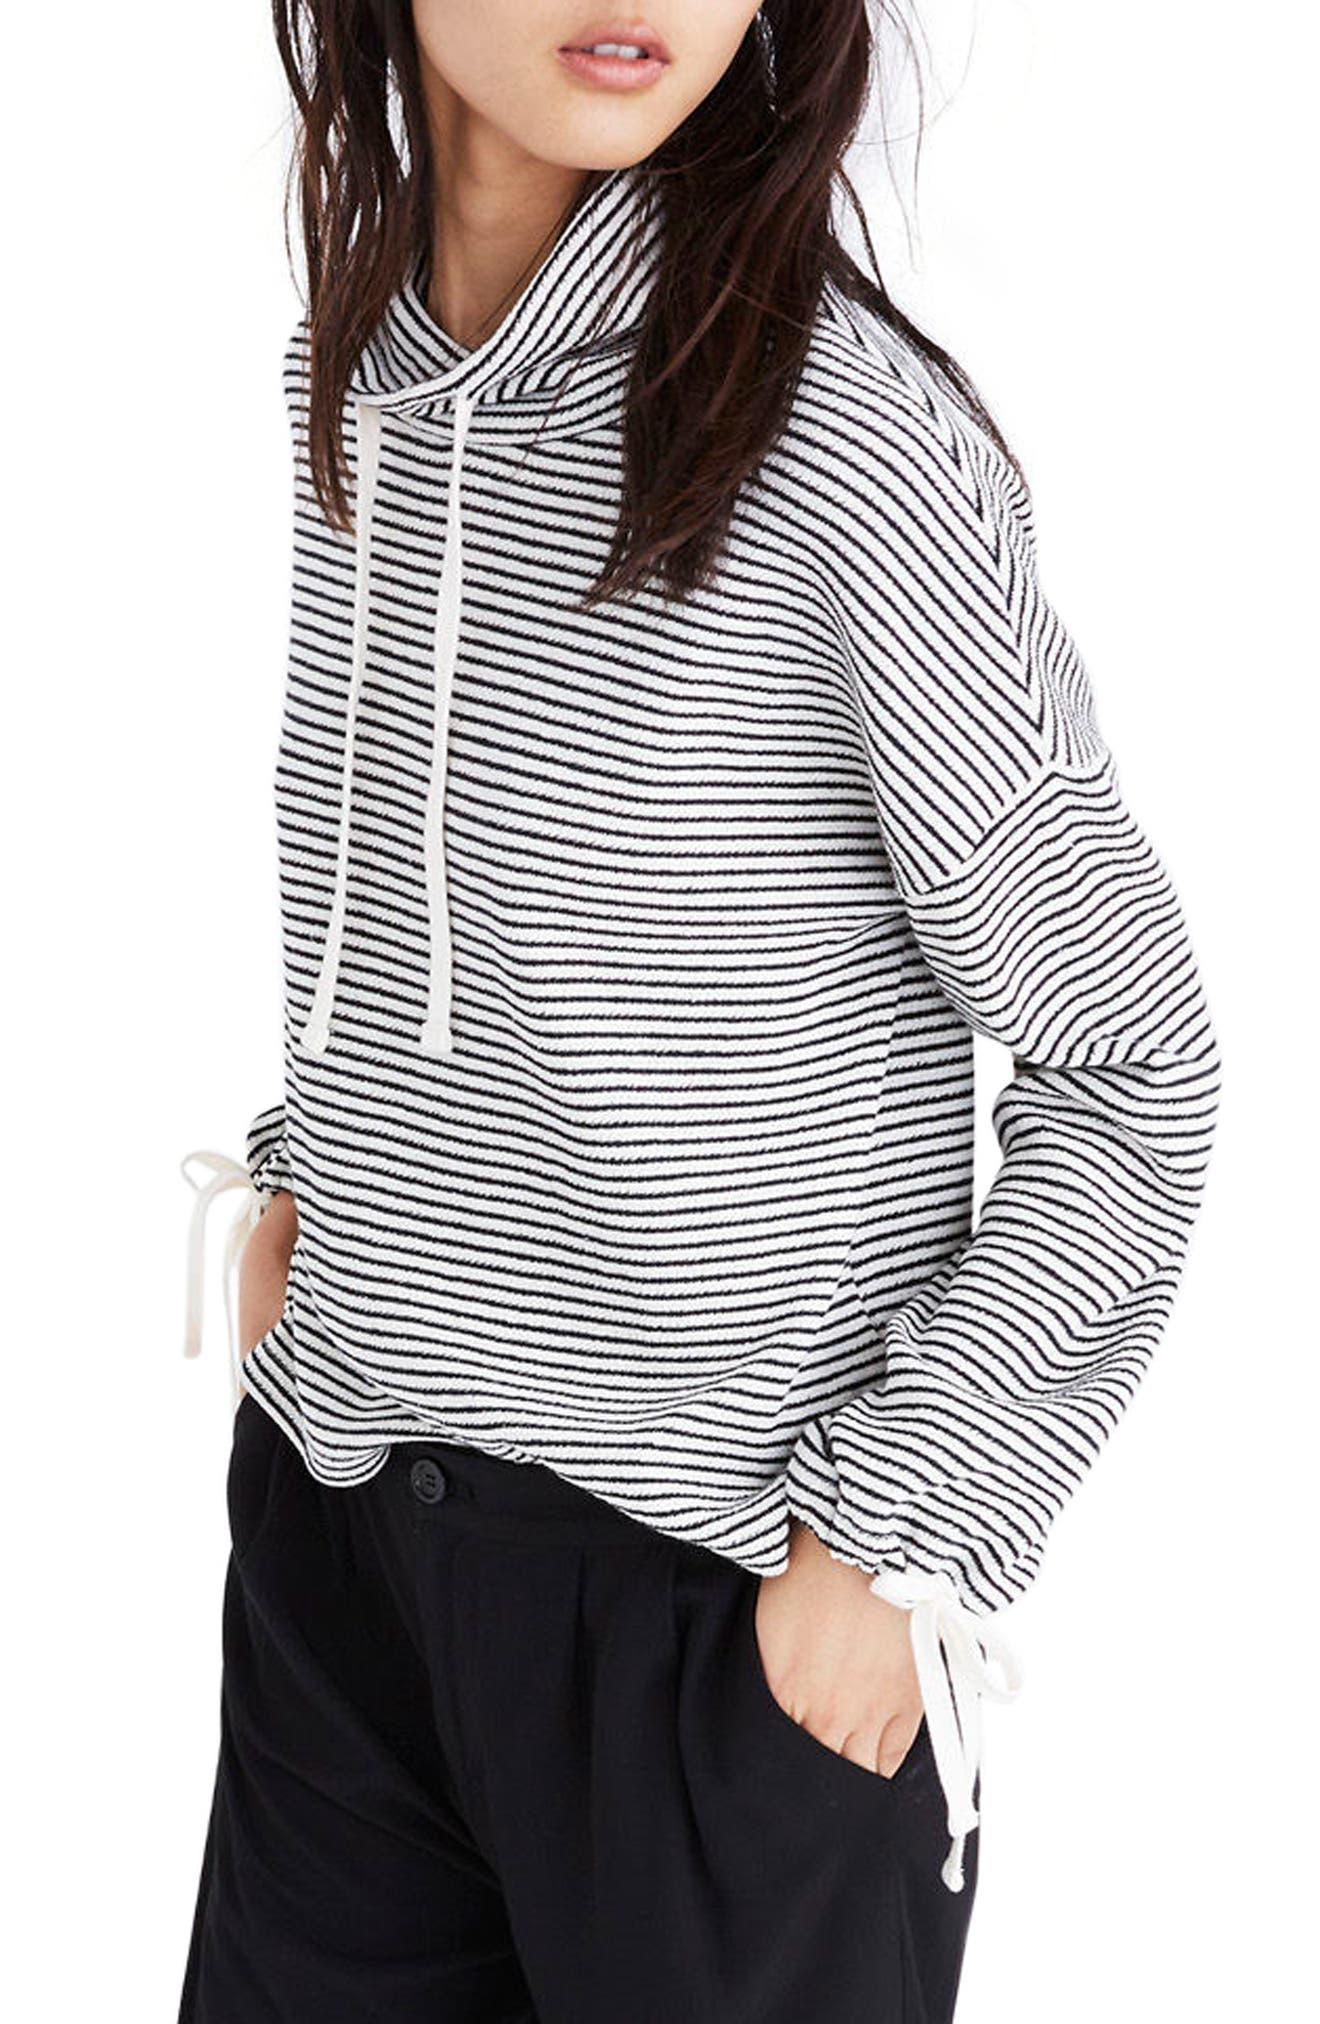 Alternate Image 1 Selected - Madewell Stripe Funnel Neck Tie Sleeve Sweatshirt